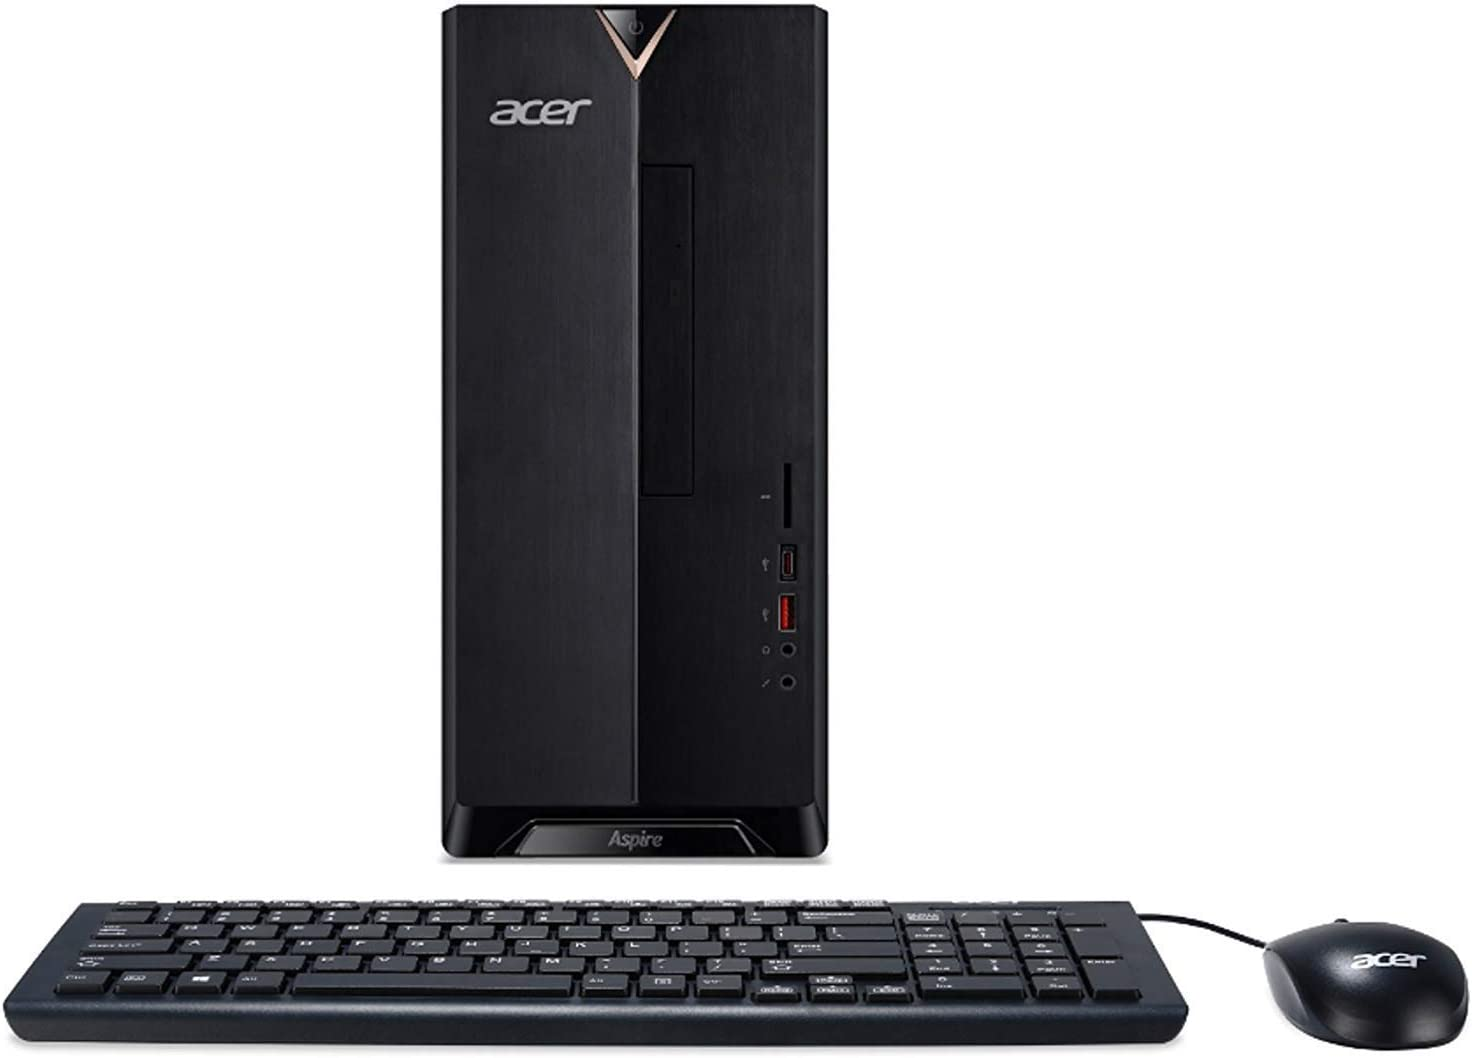 Acer Aspire TC-885 Desktop, 8th Gen Intel Core i5-8400, 8GB DDR4 + 16GB Optane Memory, 2TB HDD, 8X DVD, 802.11ac WiFi, Windows 10 Home (Renewed)